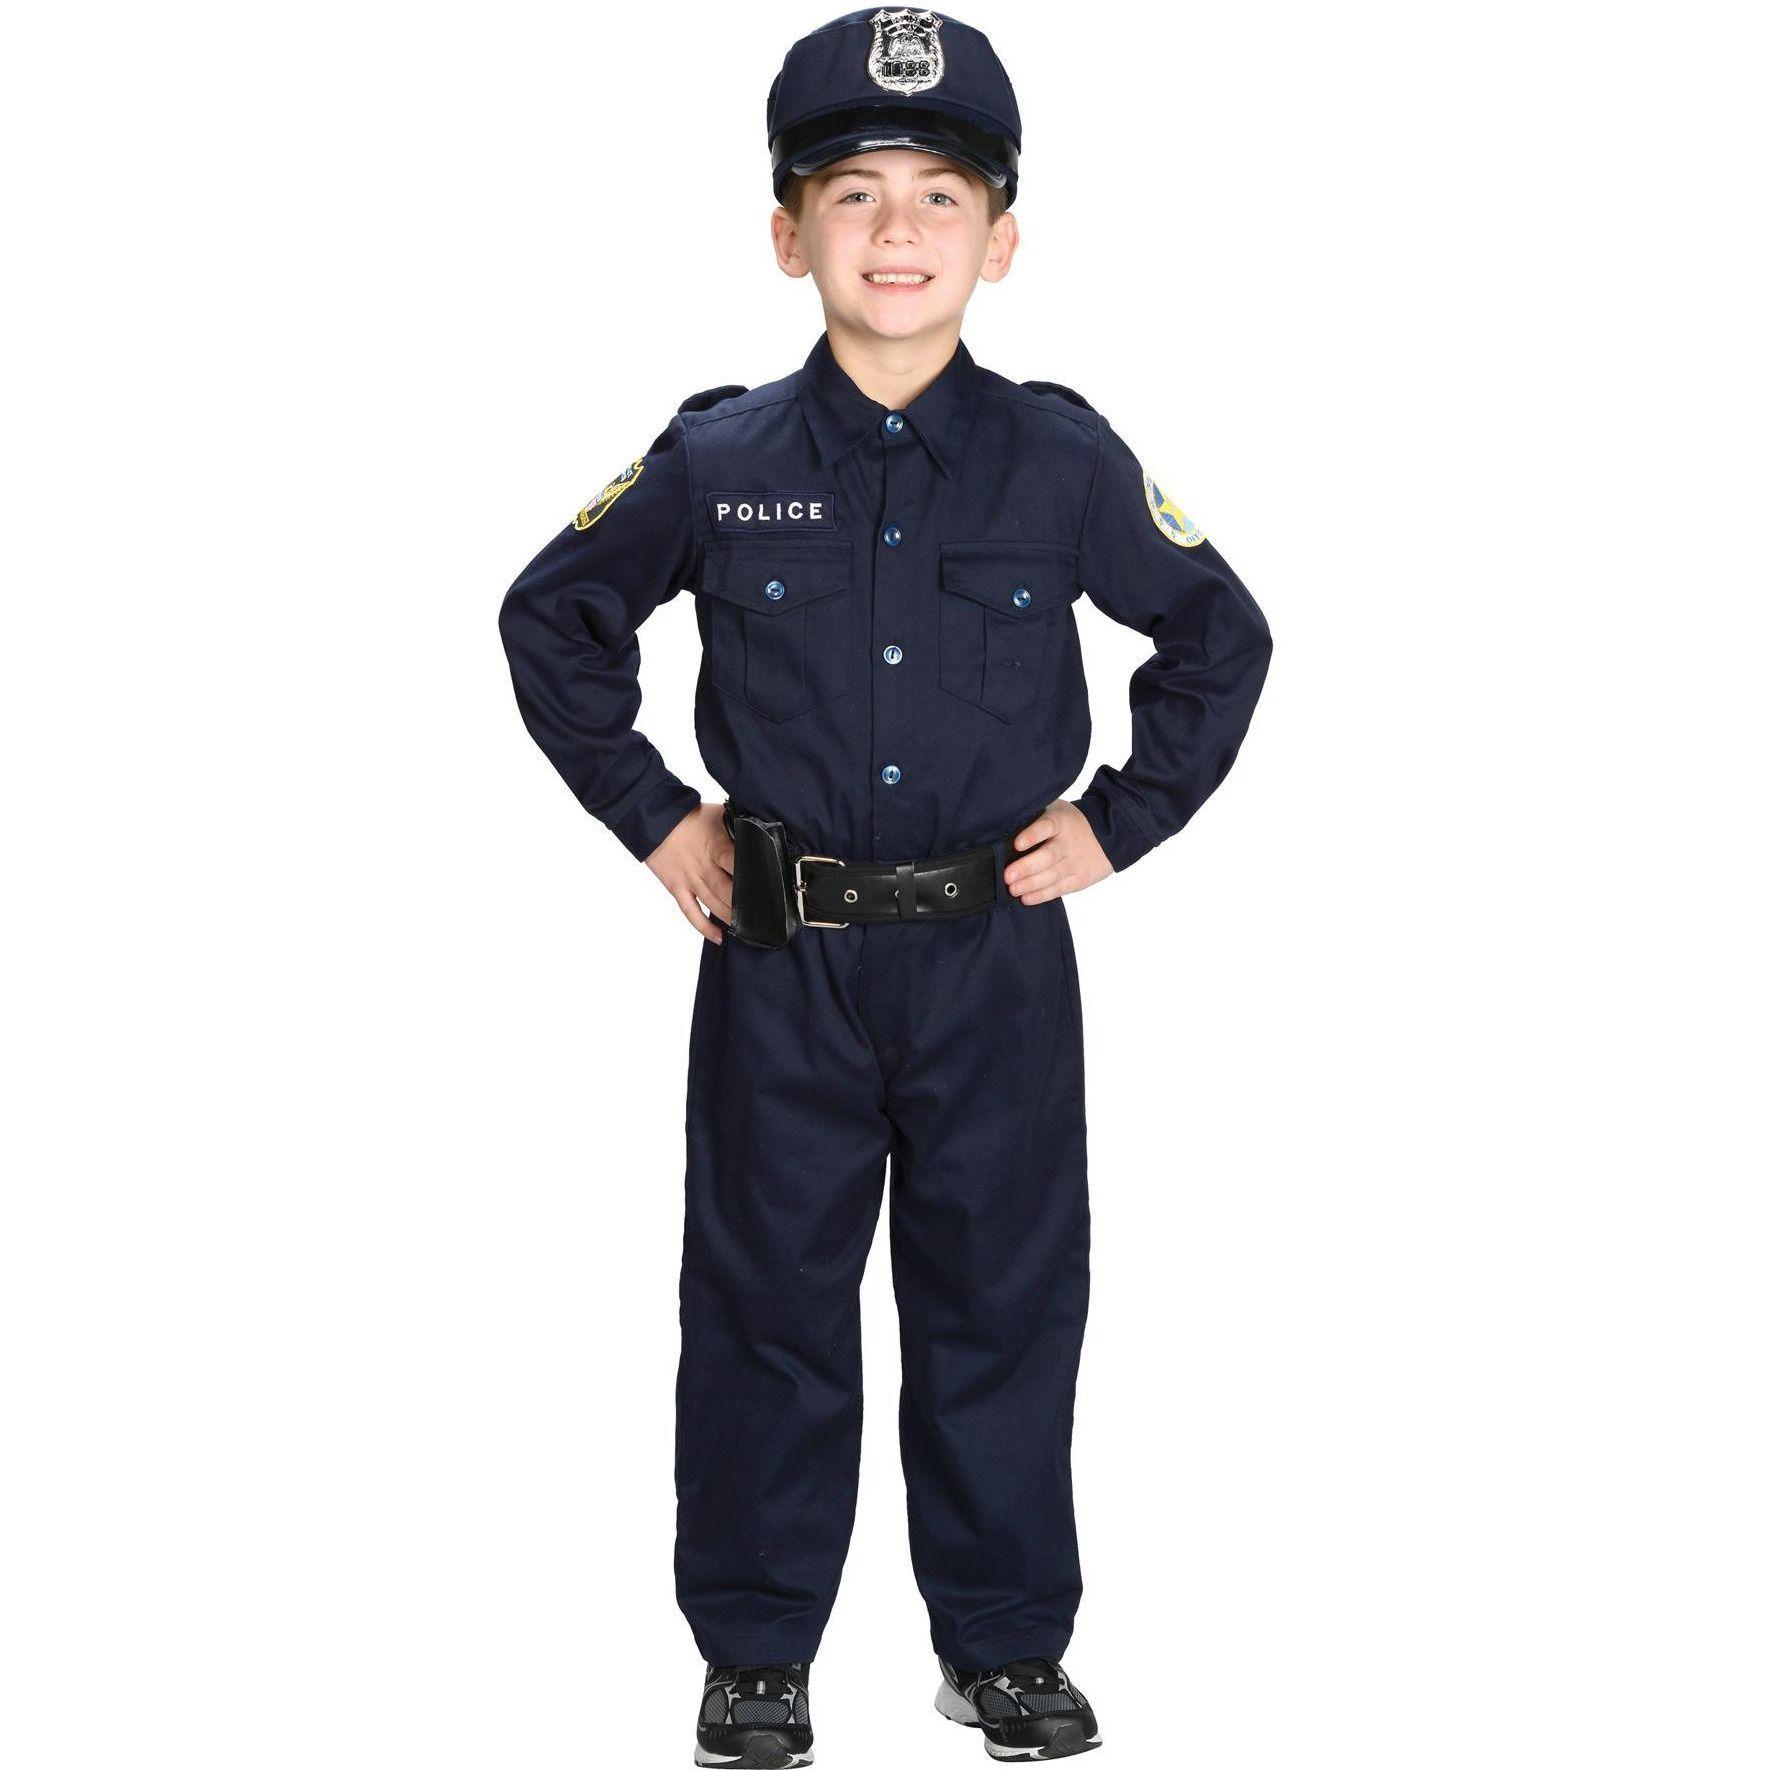 Police Officer Child 46 Police officer costume, Kids